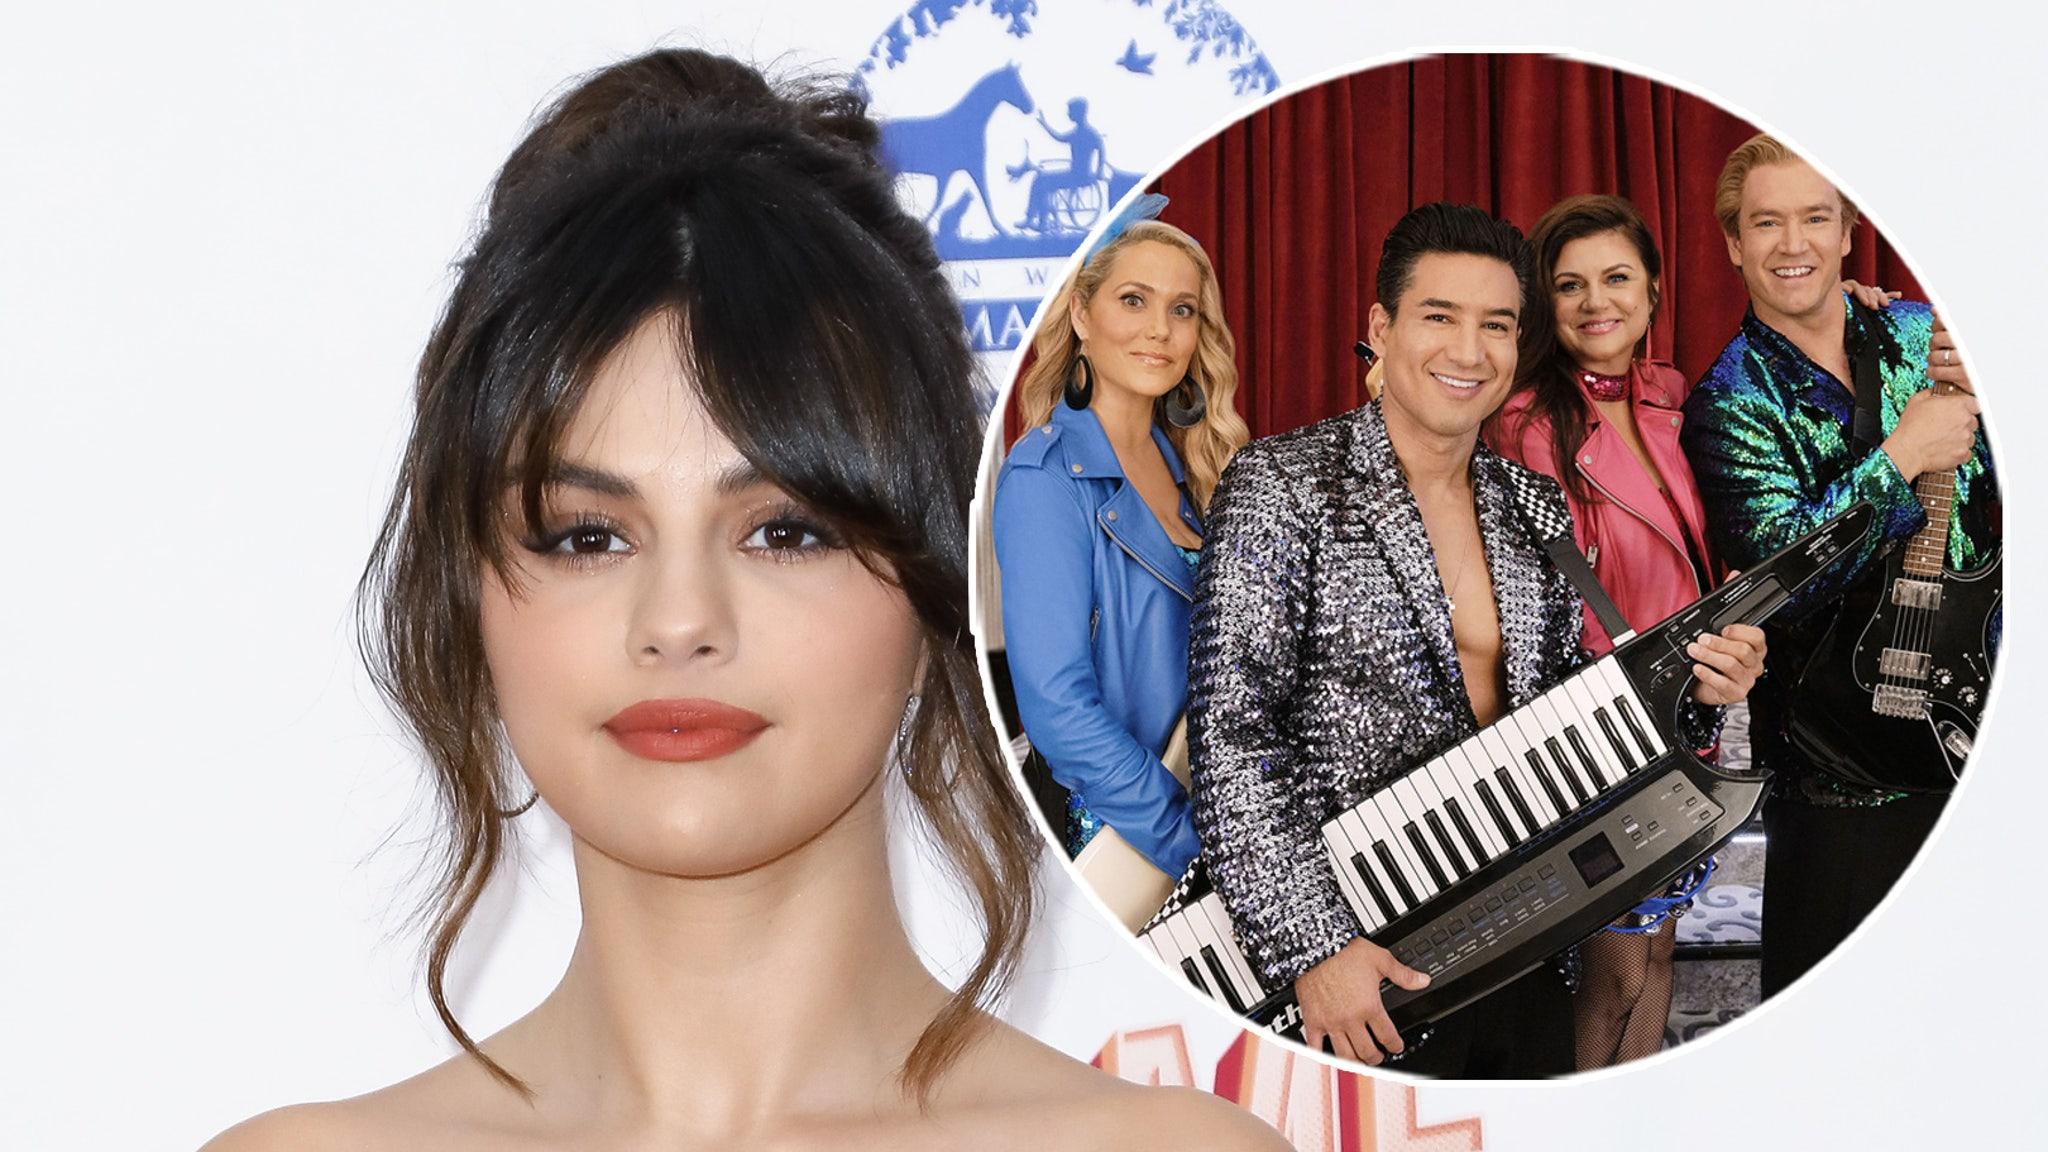 Selena Gomez Fans Slam Saved By The Bell Reboot Over Kidney Transplant Jokes